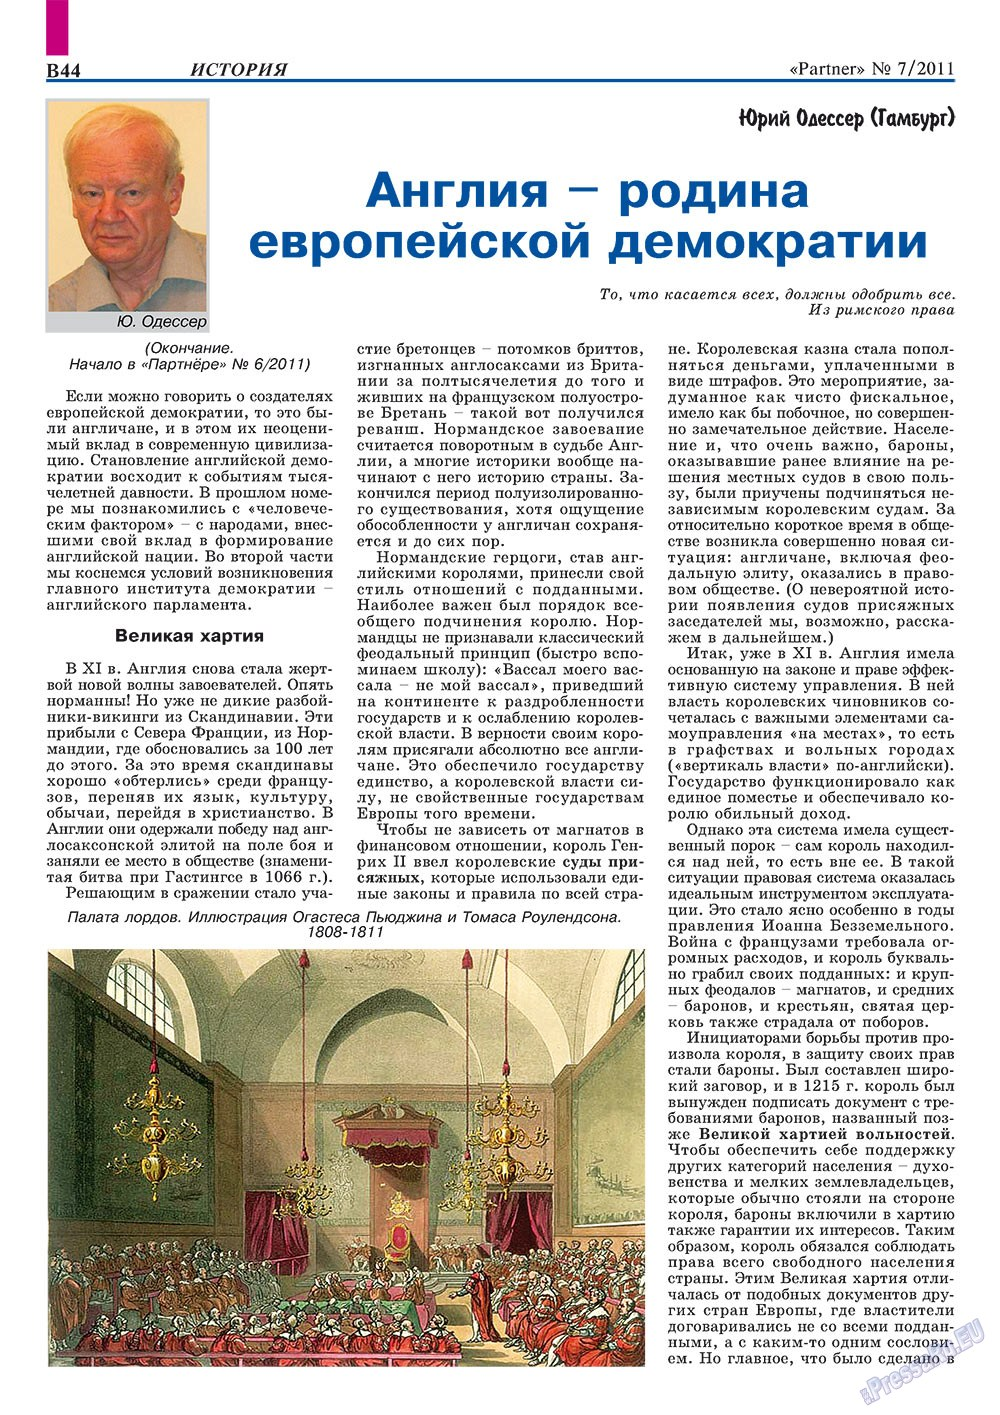 Партнер-север (журнал). 2011 год, номер 7, стр. 54